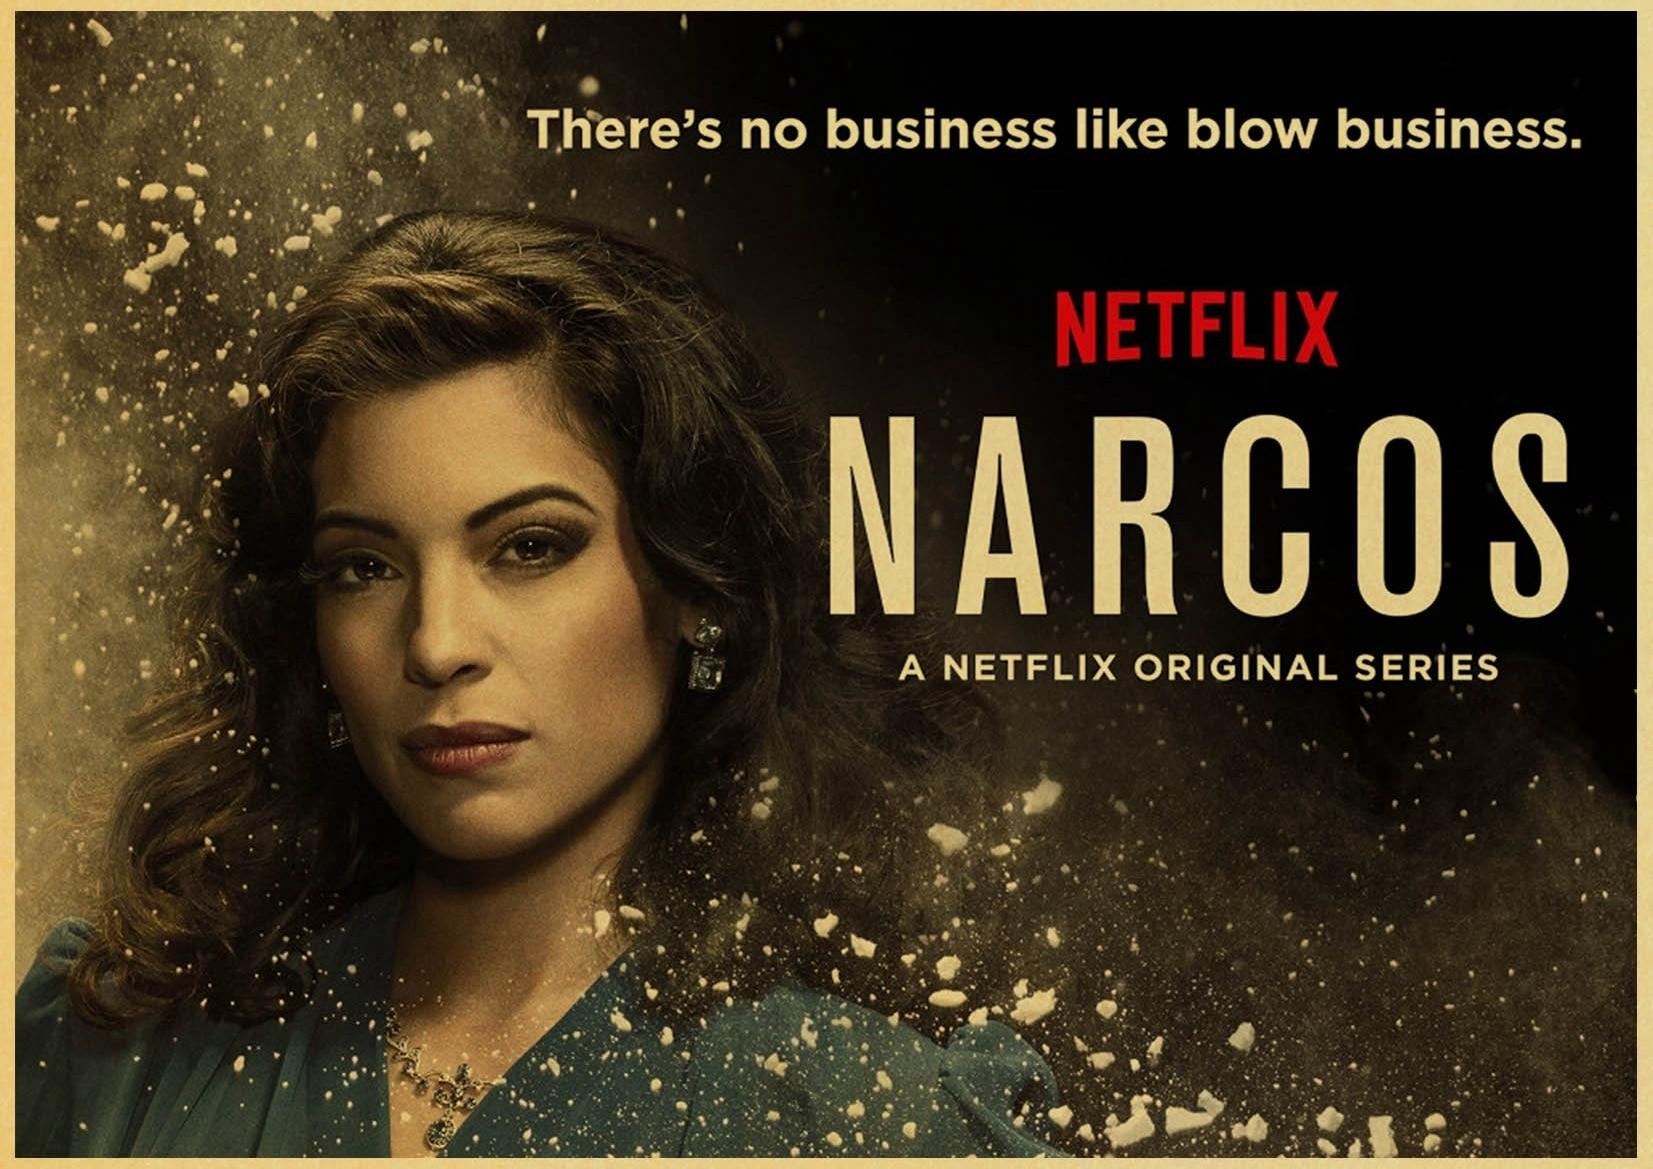 classic portrait narcos colombia pablo escobar crime tv series